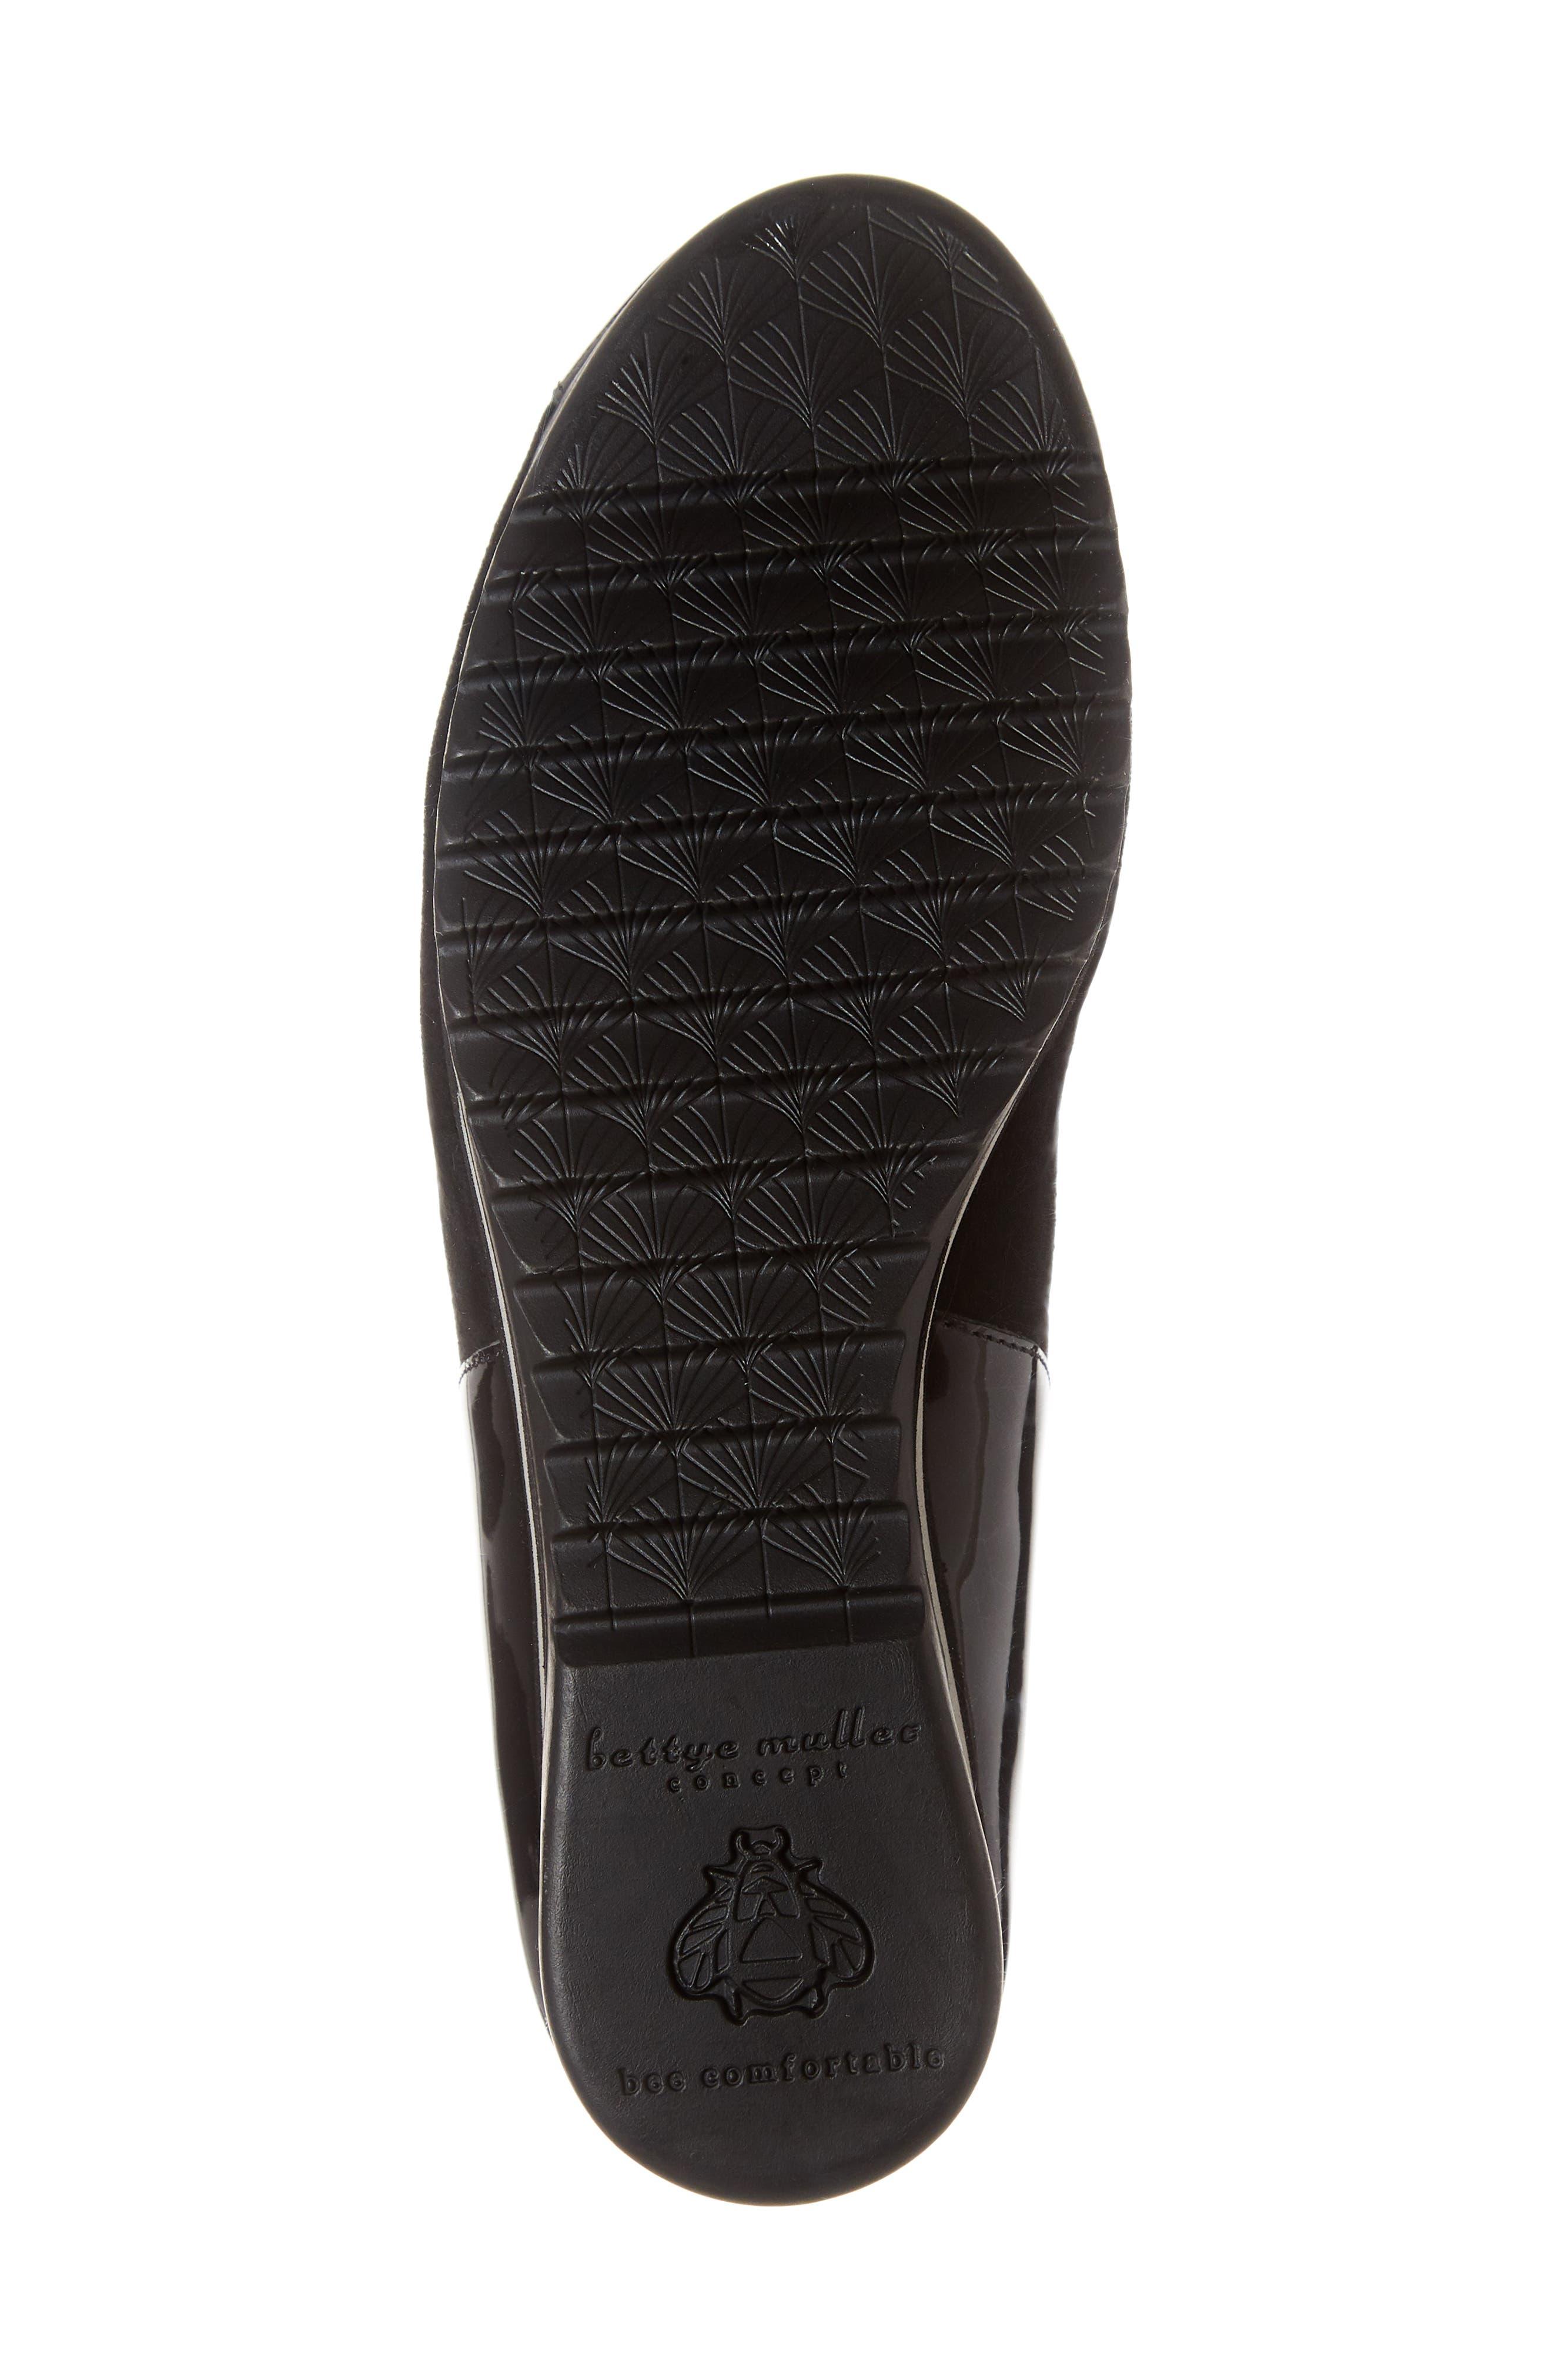 BETTYE MULLER CONCEPTS, Taytum Sneaker, Alternate thumbnail 6, color, BLACK SUEDE